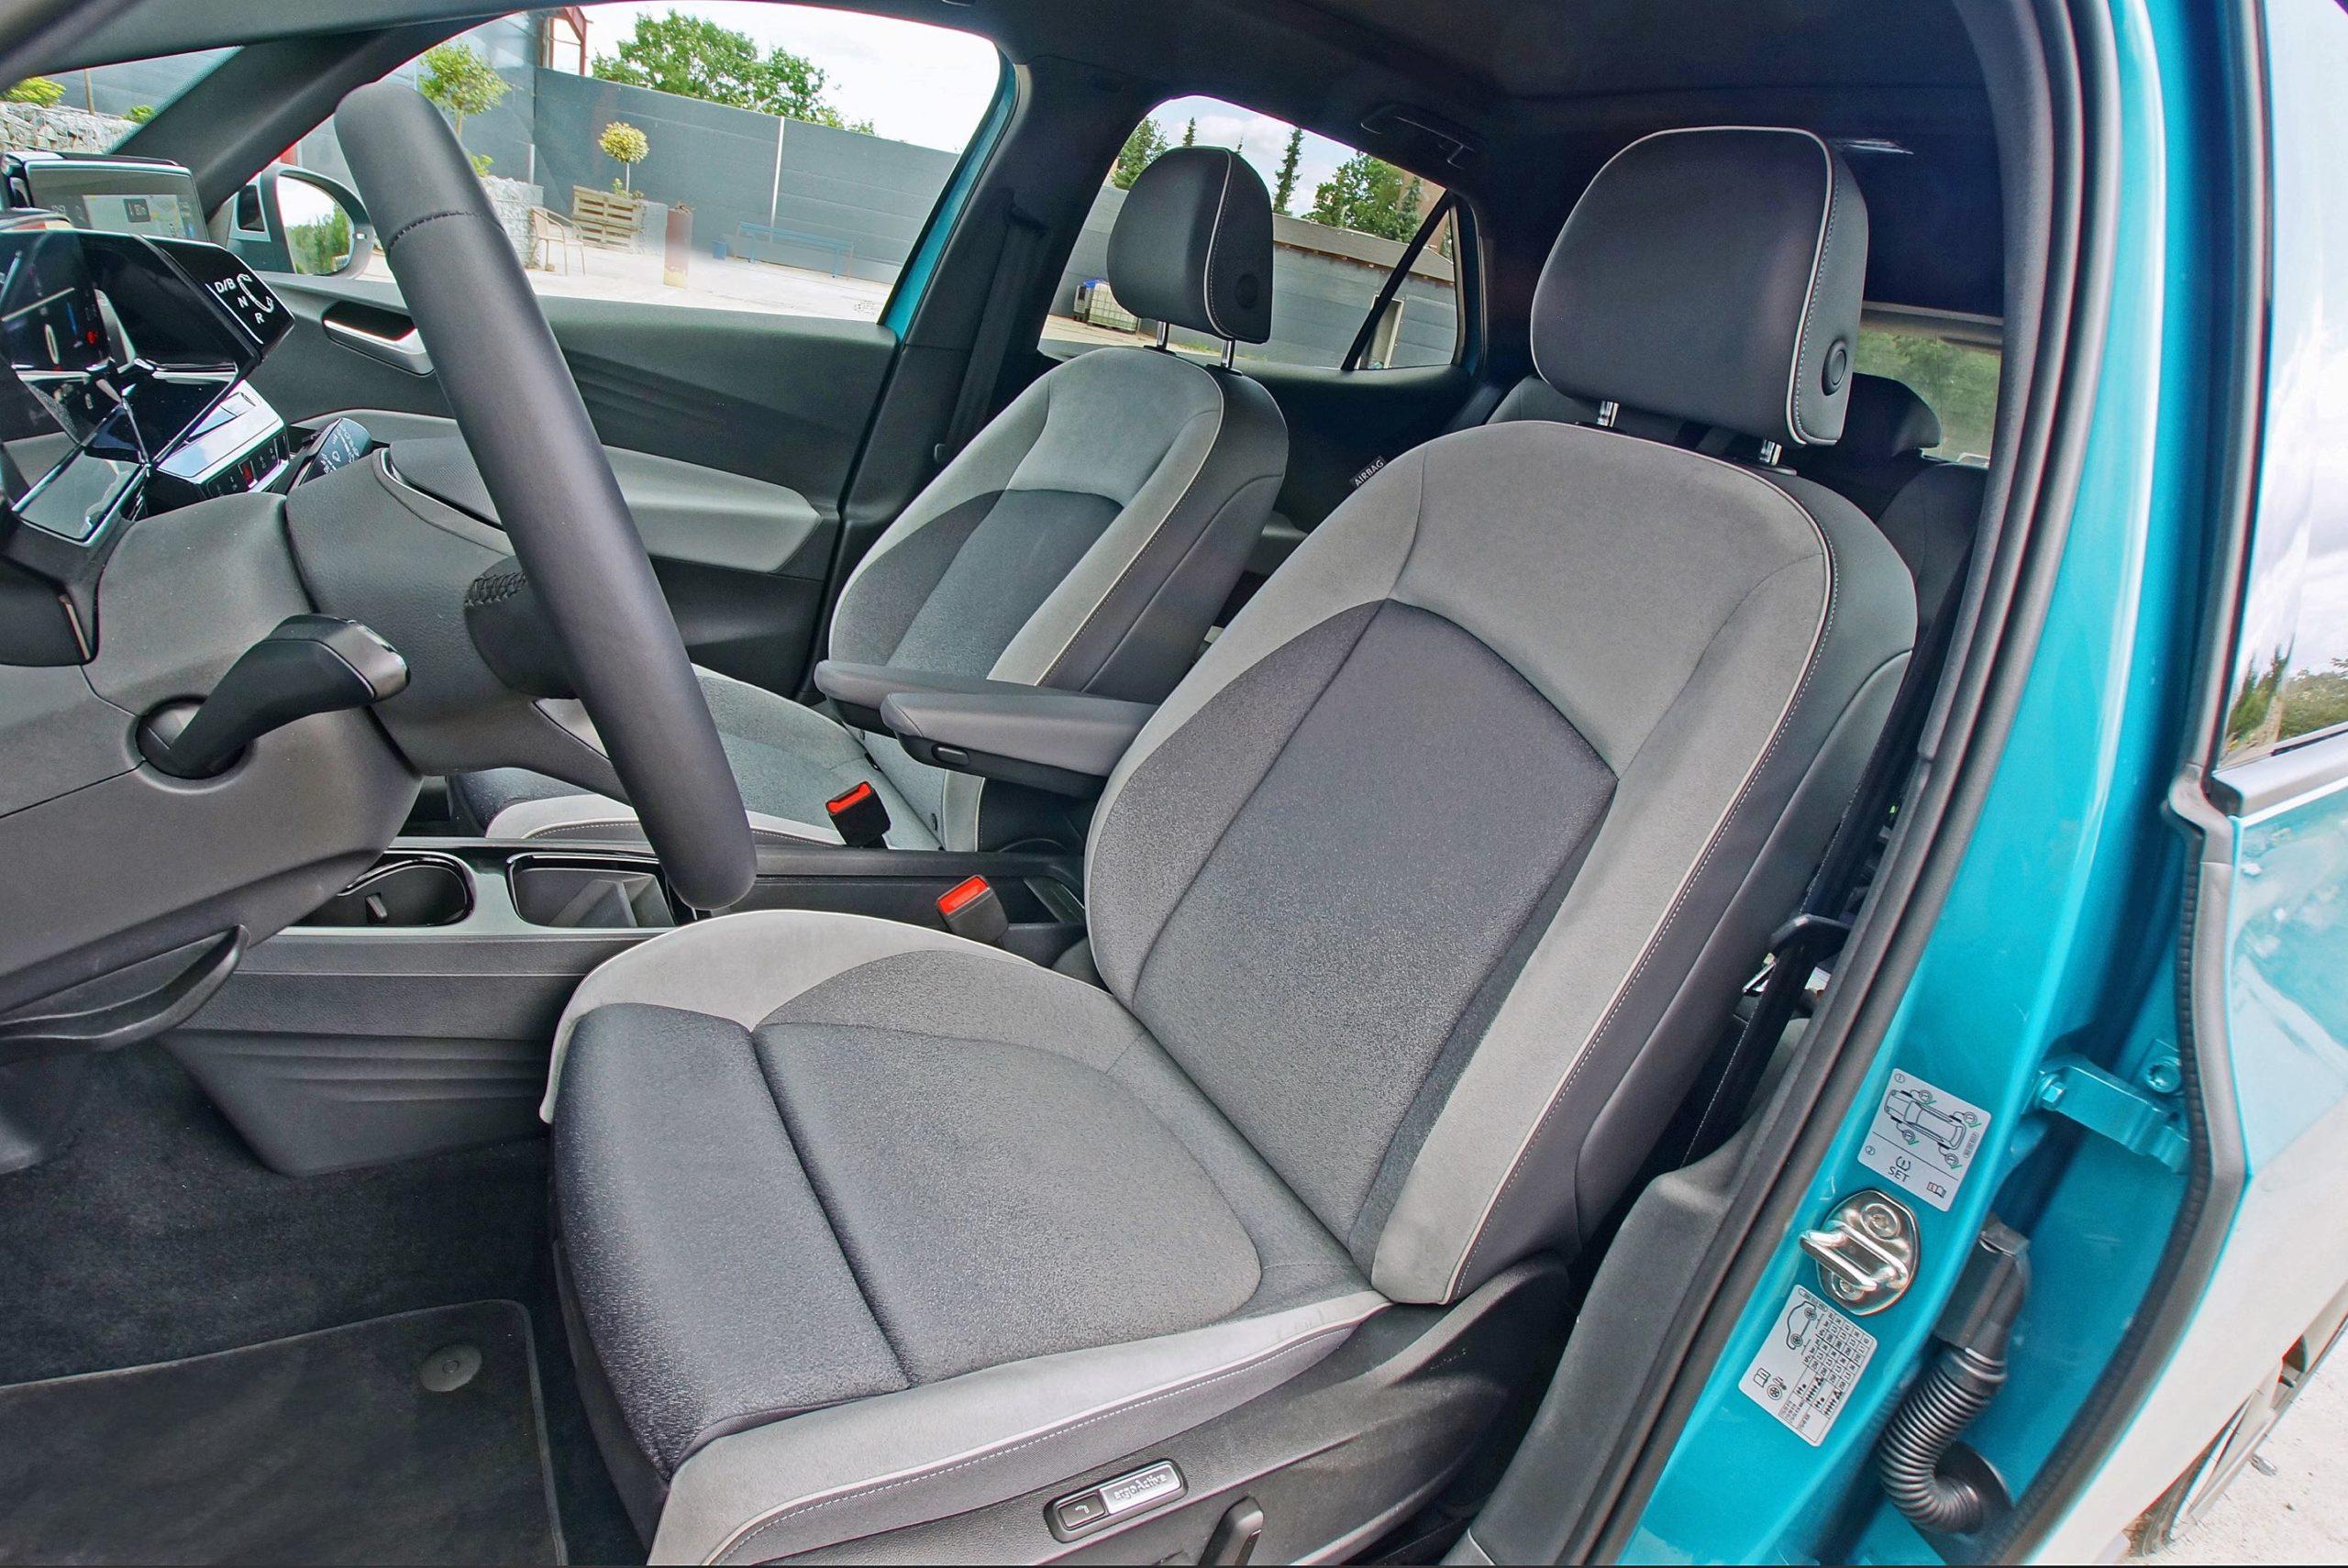 VW ID 3 Seats